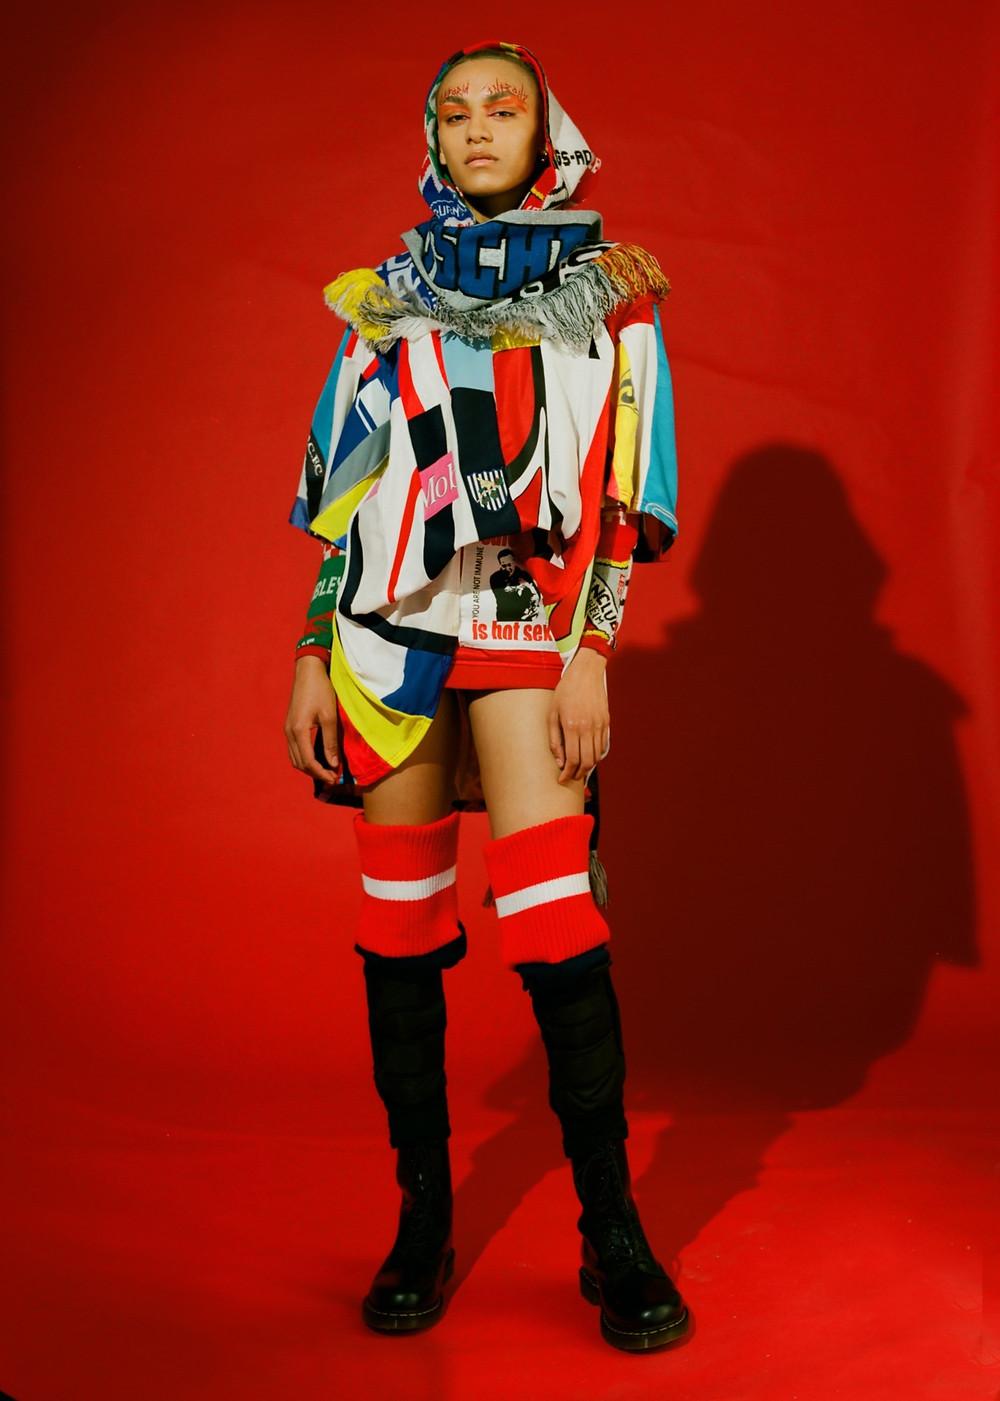 anti brexit fashion collection, Philip Ellis Collection, Philip Ellis Brexit collection, fashion, up and coming designers, new fashion designer, political fashion designers